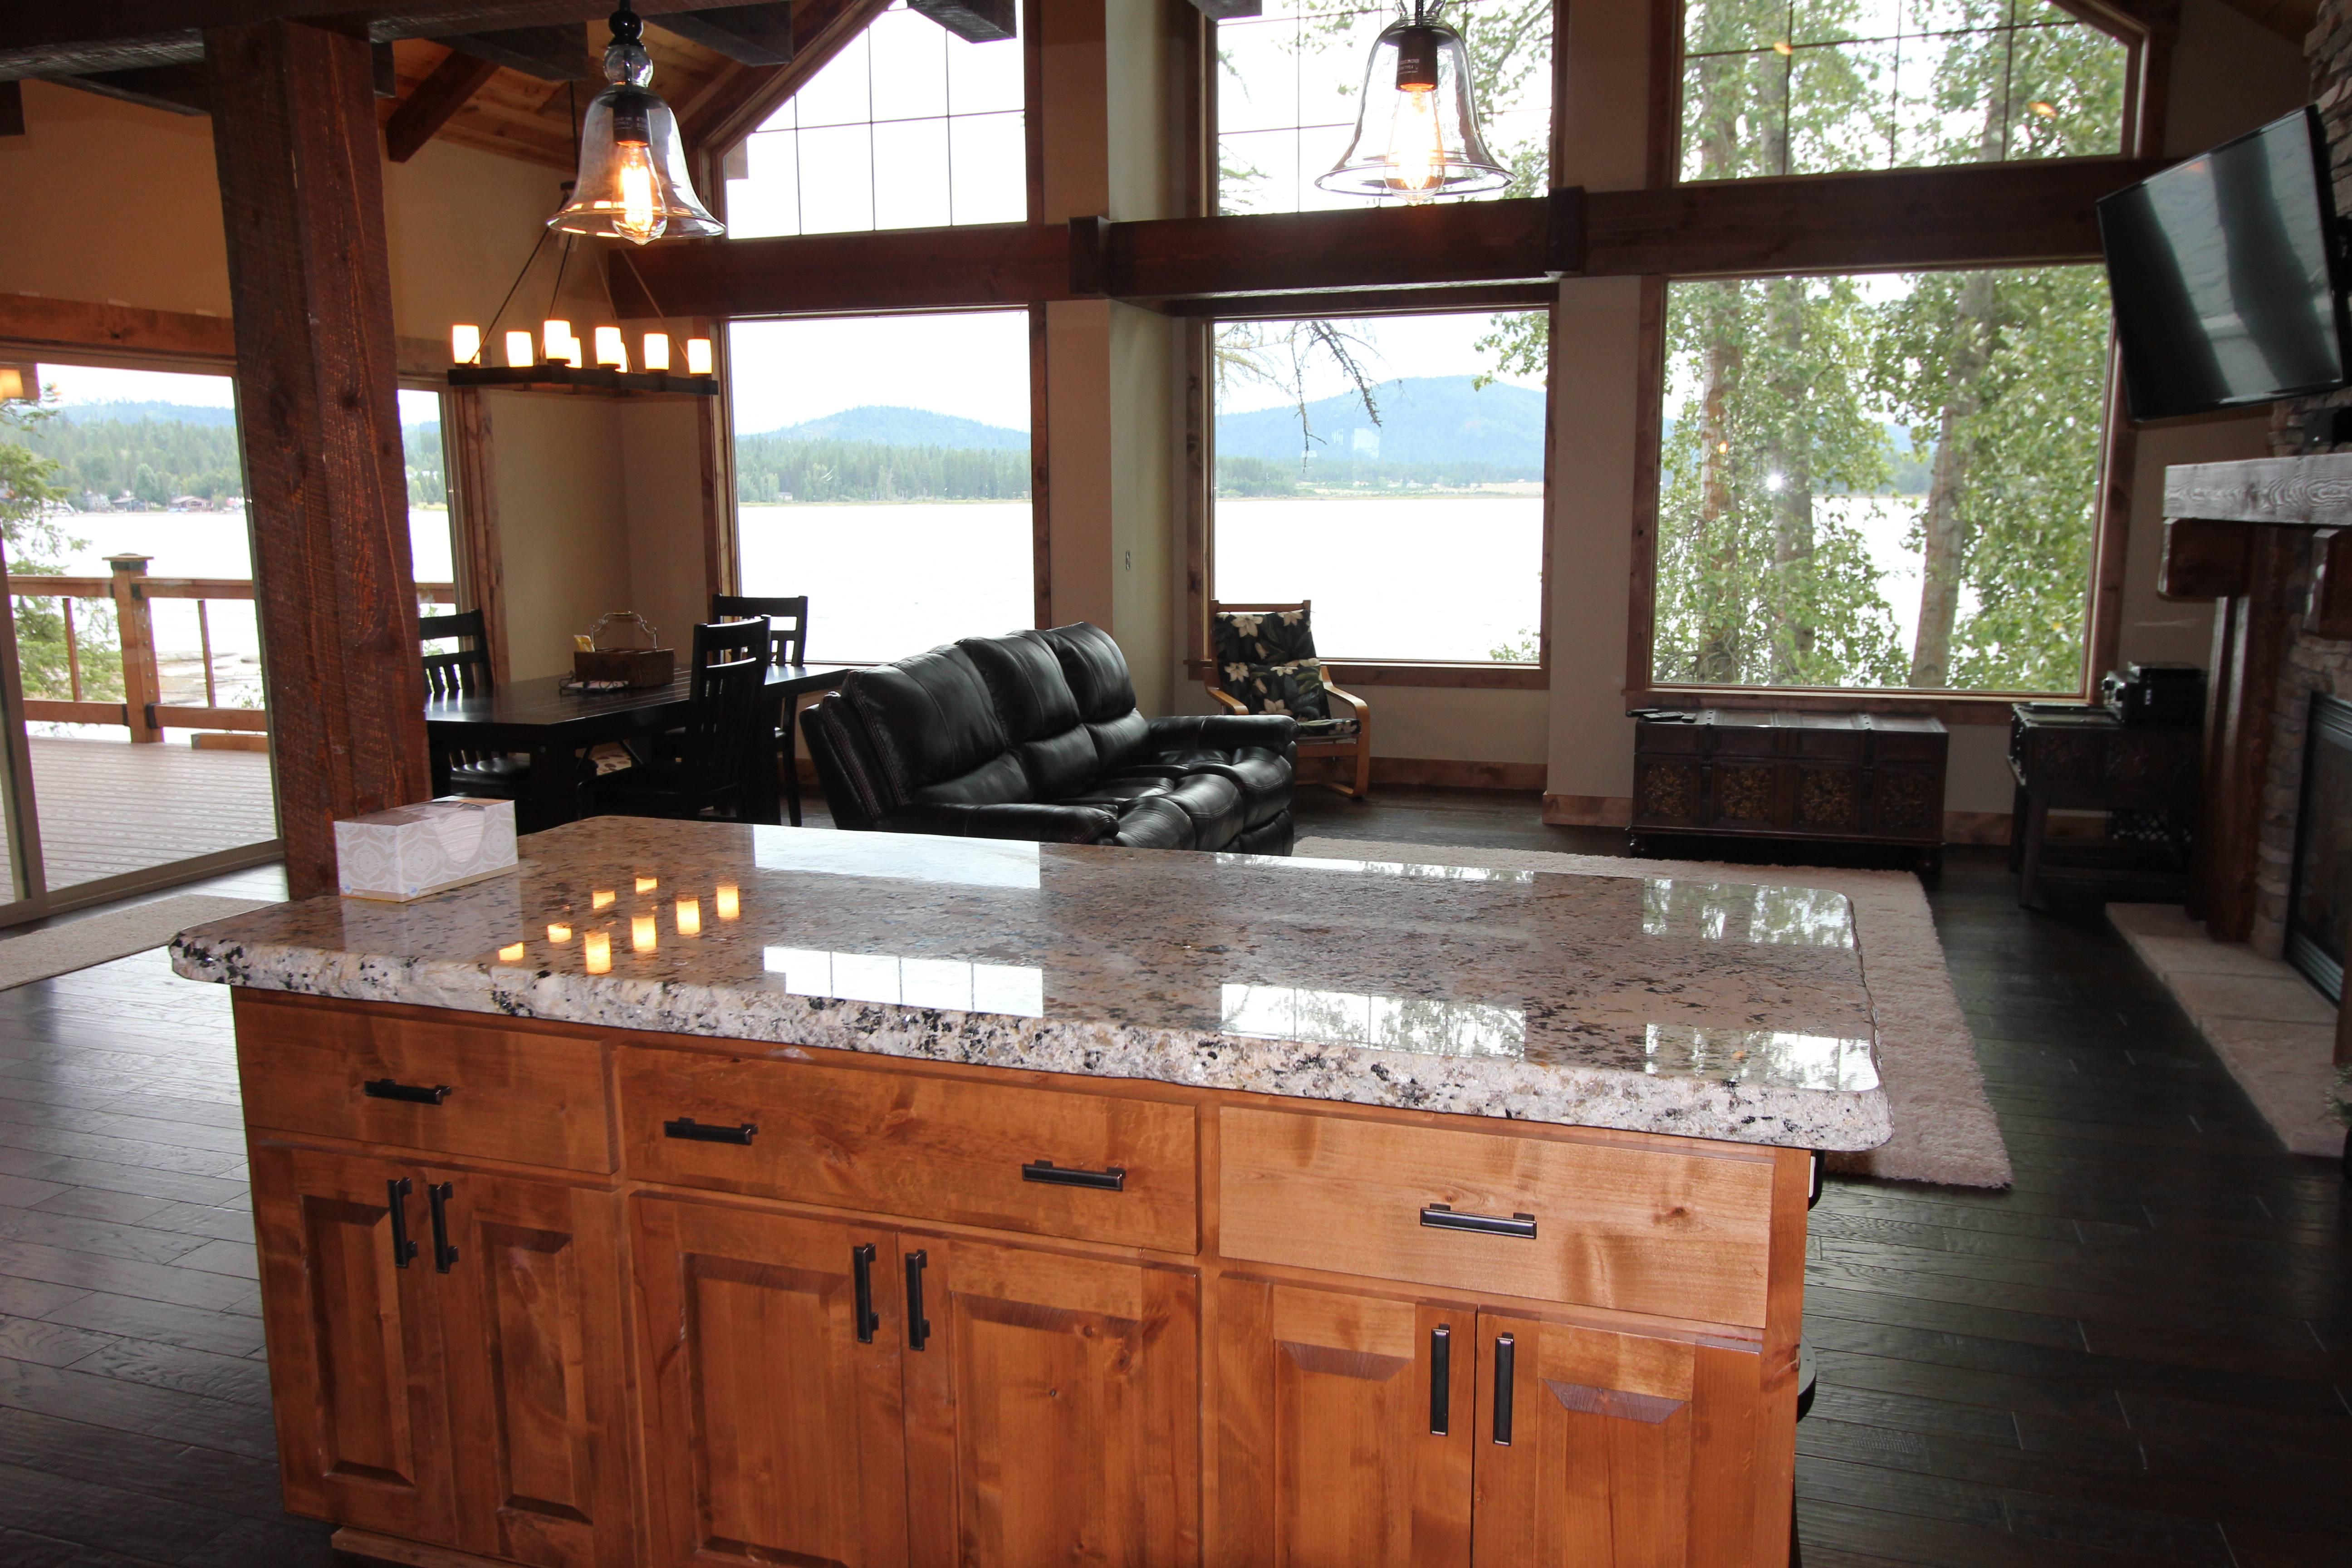 Kitchen Island - Chiseled Granite Countertop